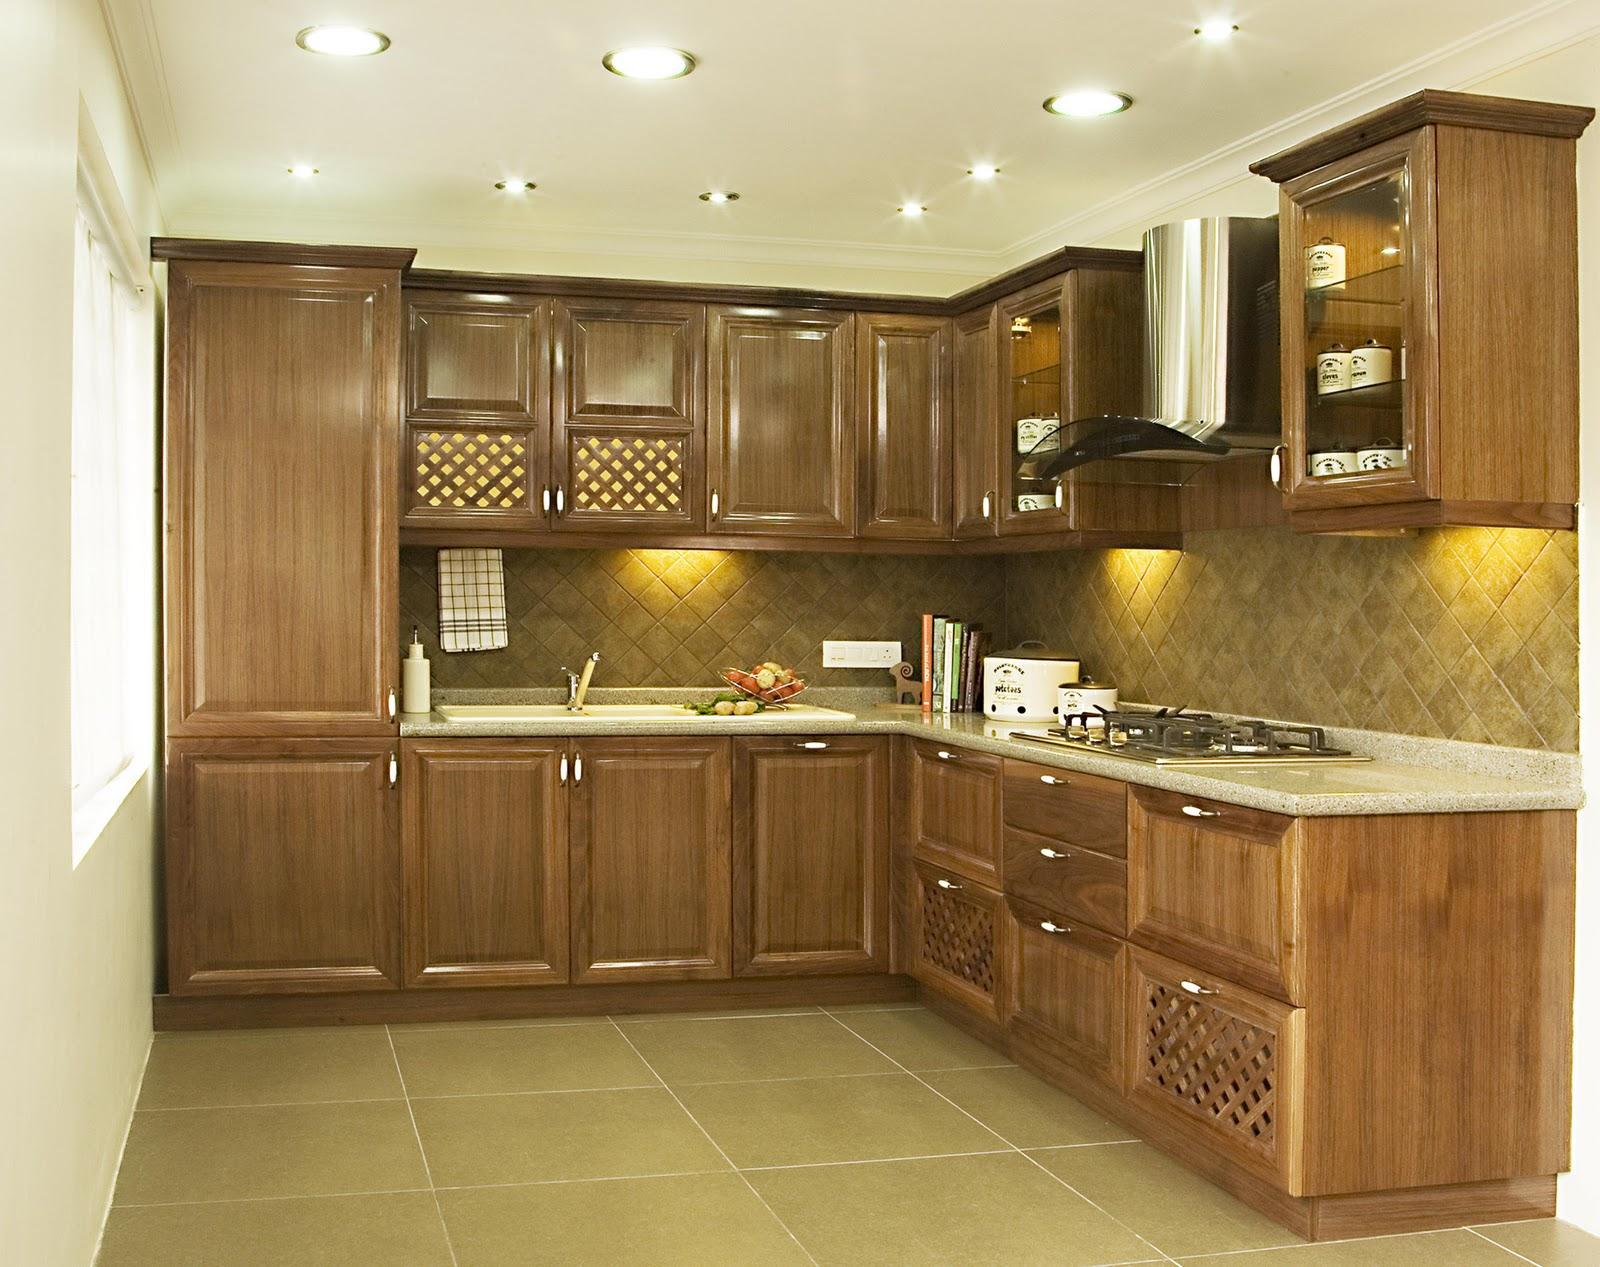 (830)-730-8484 | TODD RZECHULA, OWNER on Model Kitchen Design  id=87629